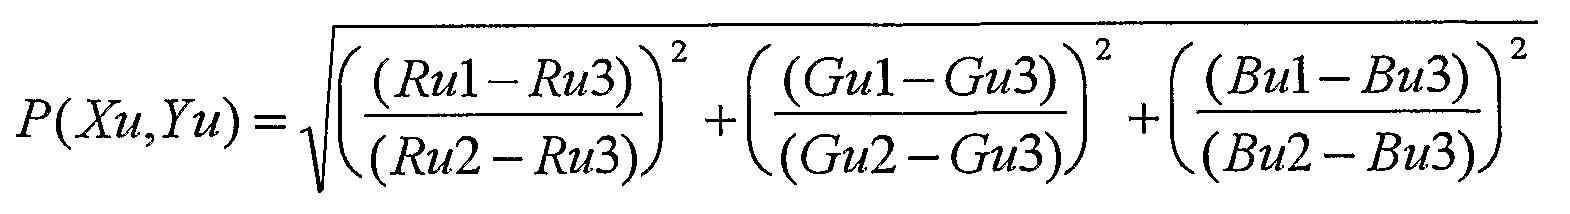 Figure 112005002401275-pct00001